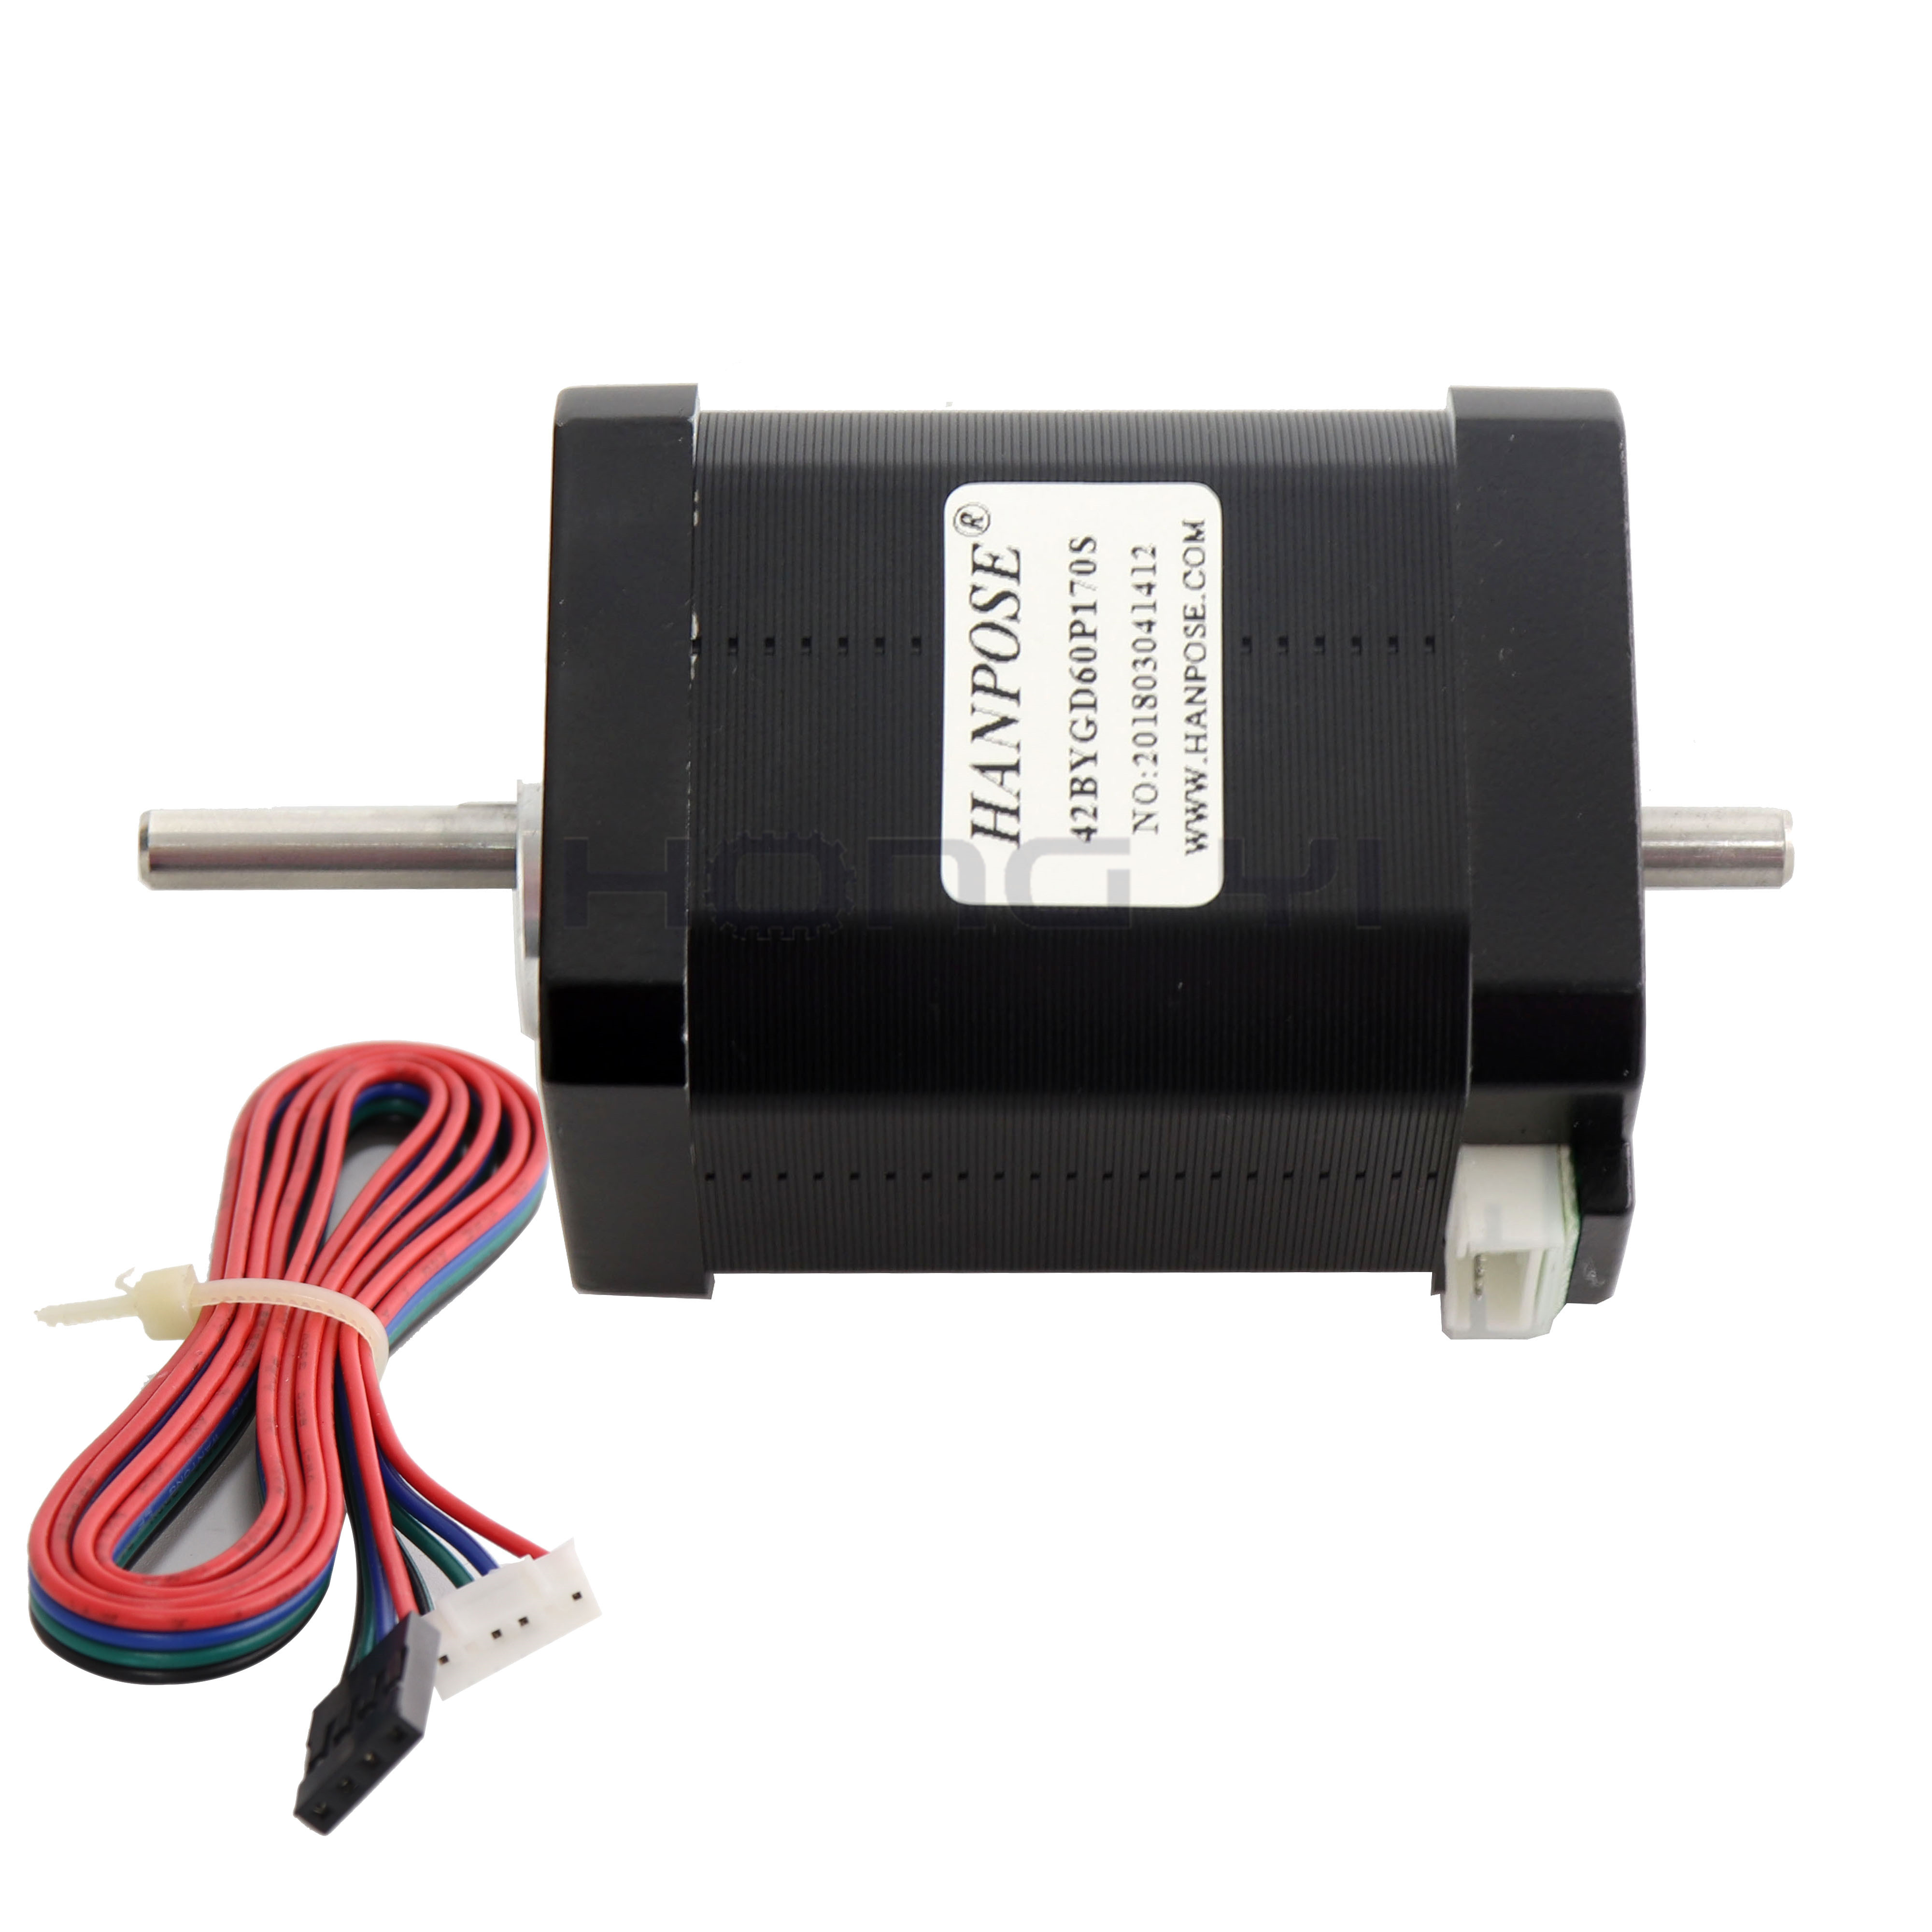 Image 2 - Free shipping hybrid stepper motor nema 17 motor 60mm (1.7A, 0.73NM, 60mm, 4 wire) 17HS6401S for 3D printer cncStepper Motor   -